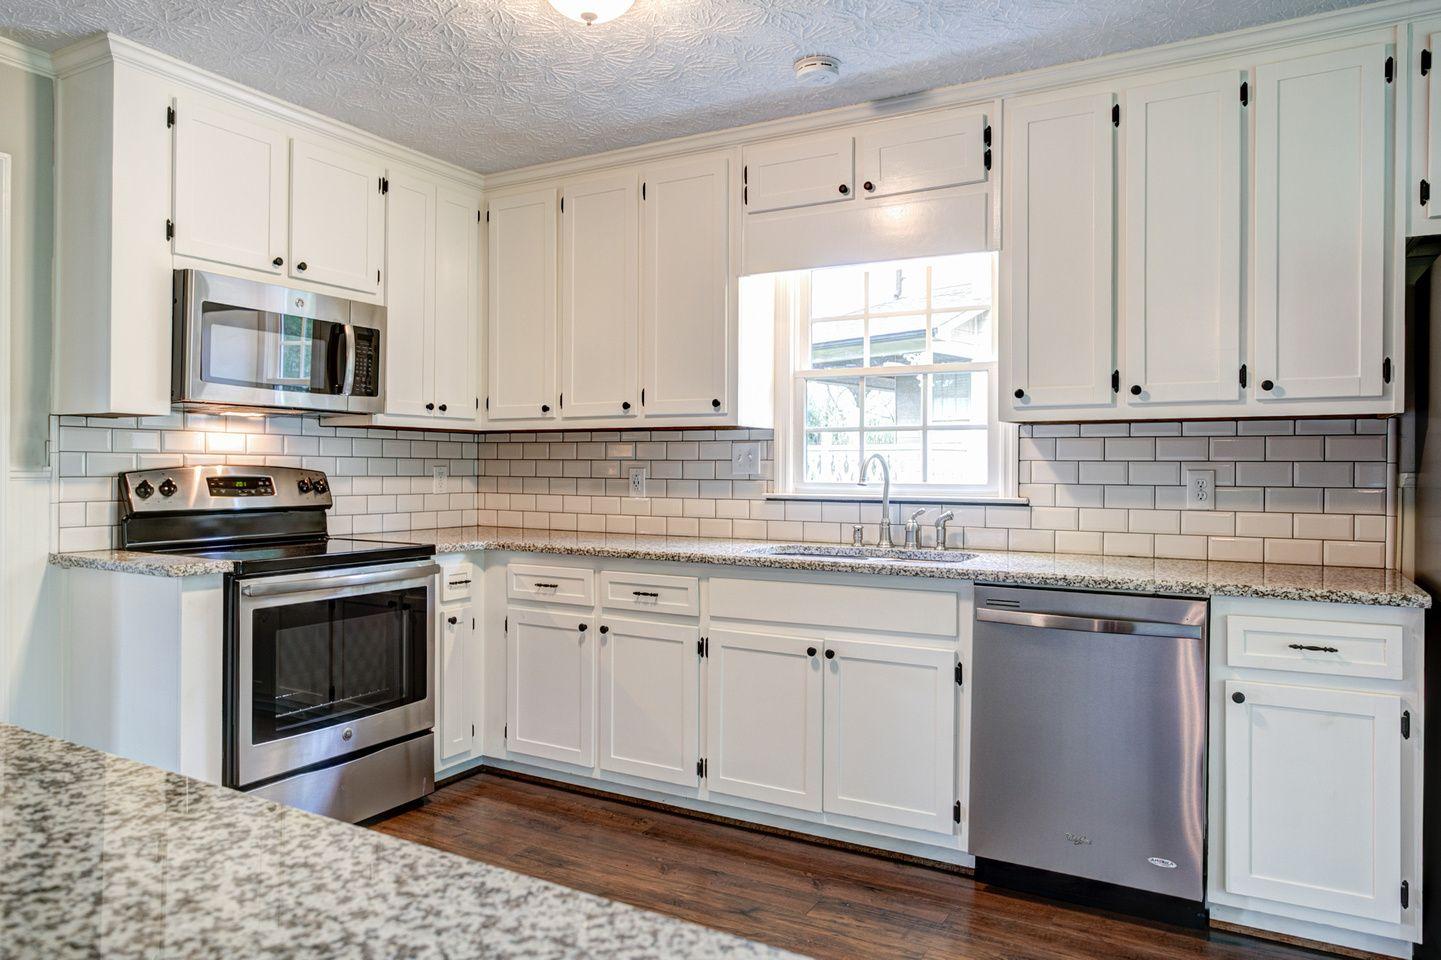 2127 Tully Wren Ne Marietta Ga 30066 Kitchen 7 Edit Kitchen Kitchen Cabinets Home Decor